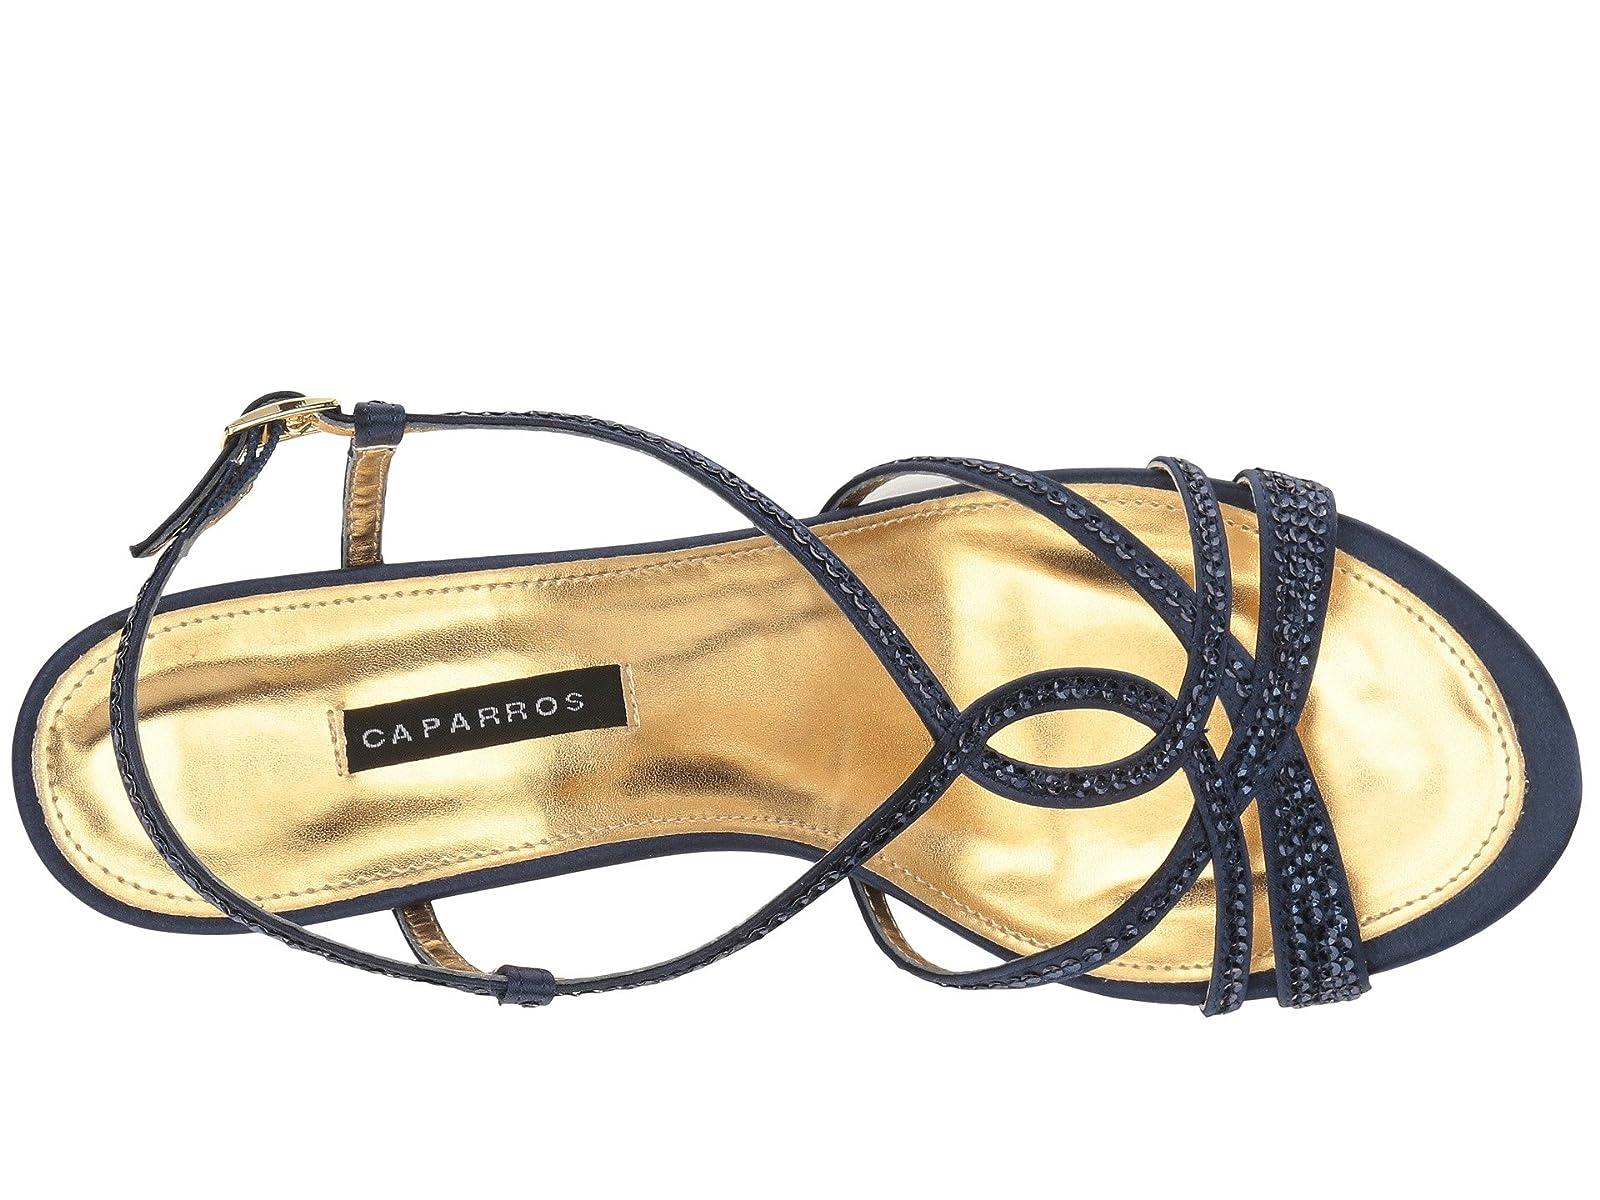 Gentleman/Lady Caparros Caparros Caparros Pandora  High Quality and Affordable 8d2d65